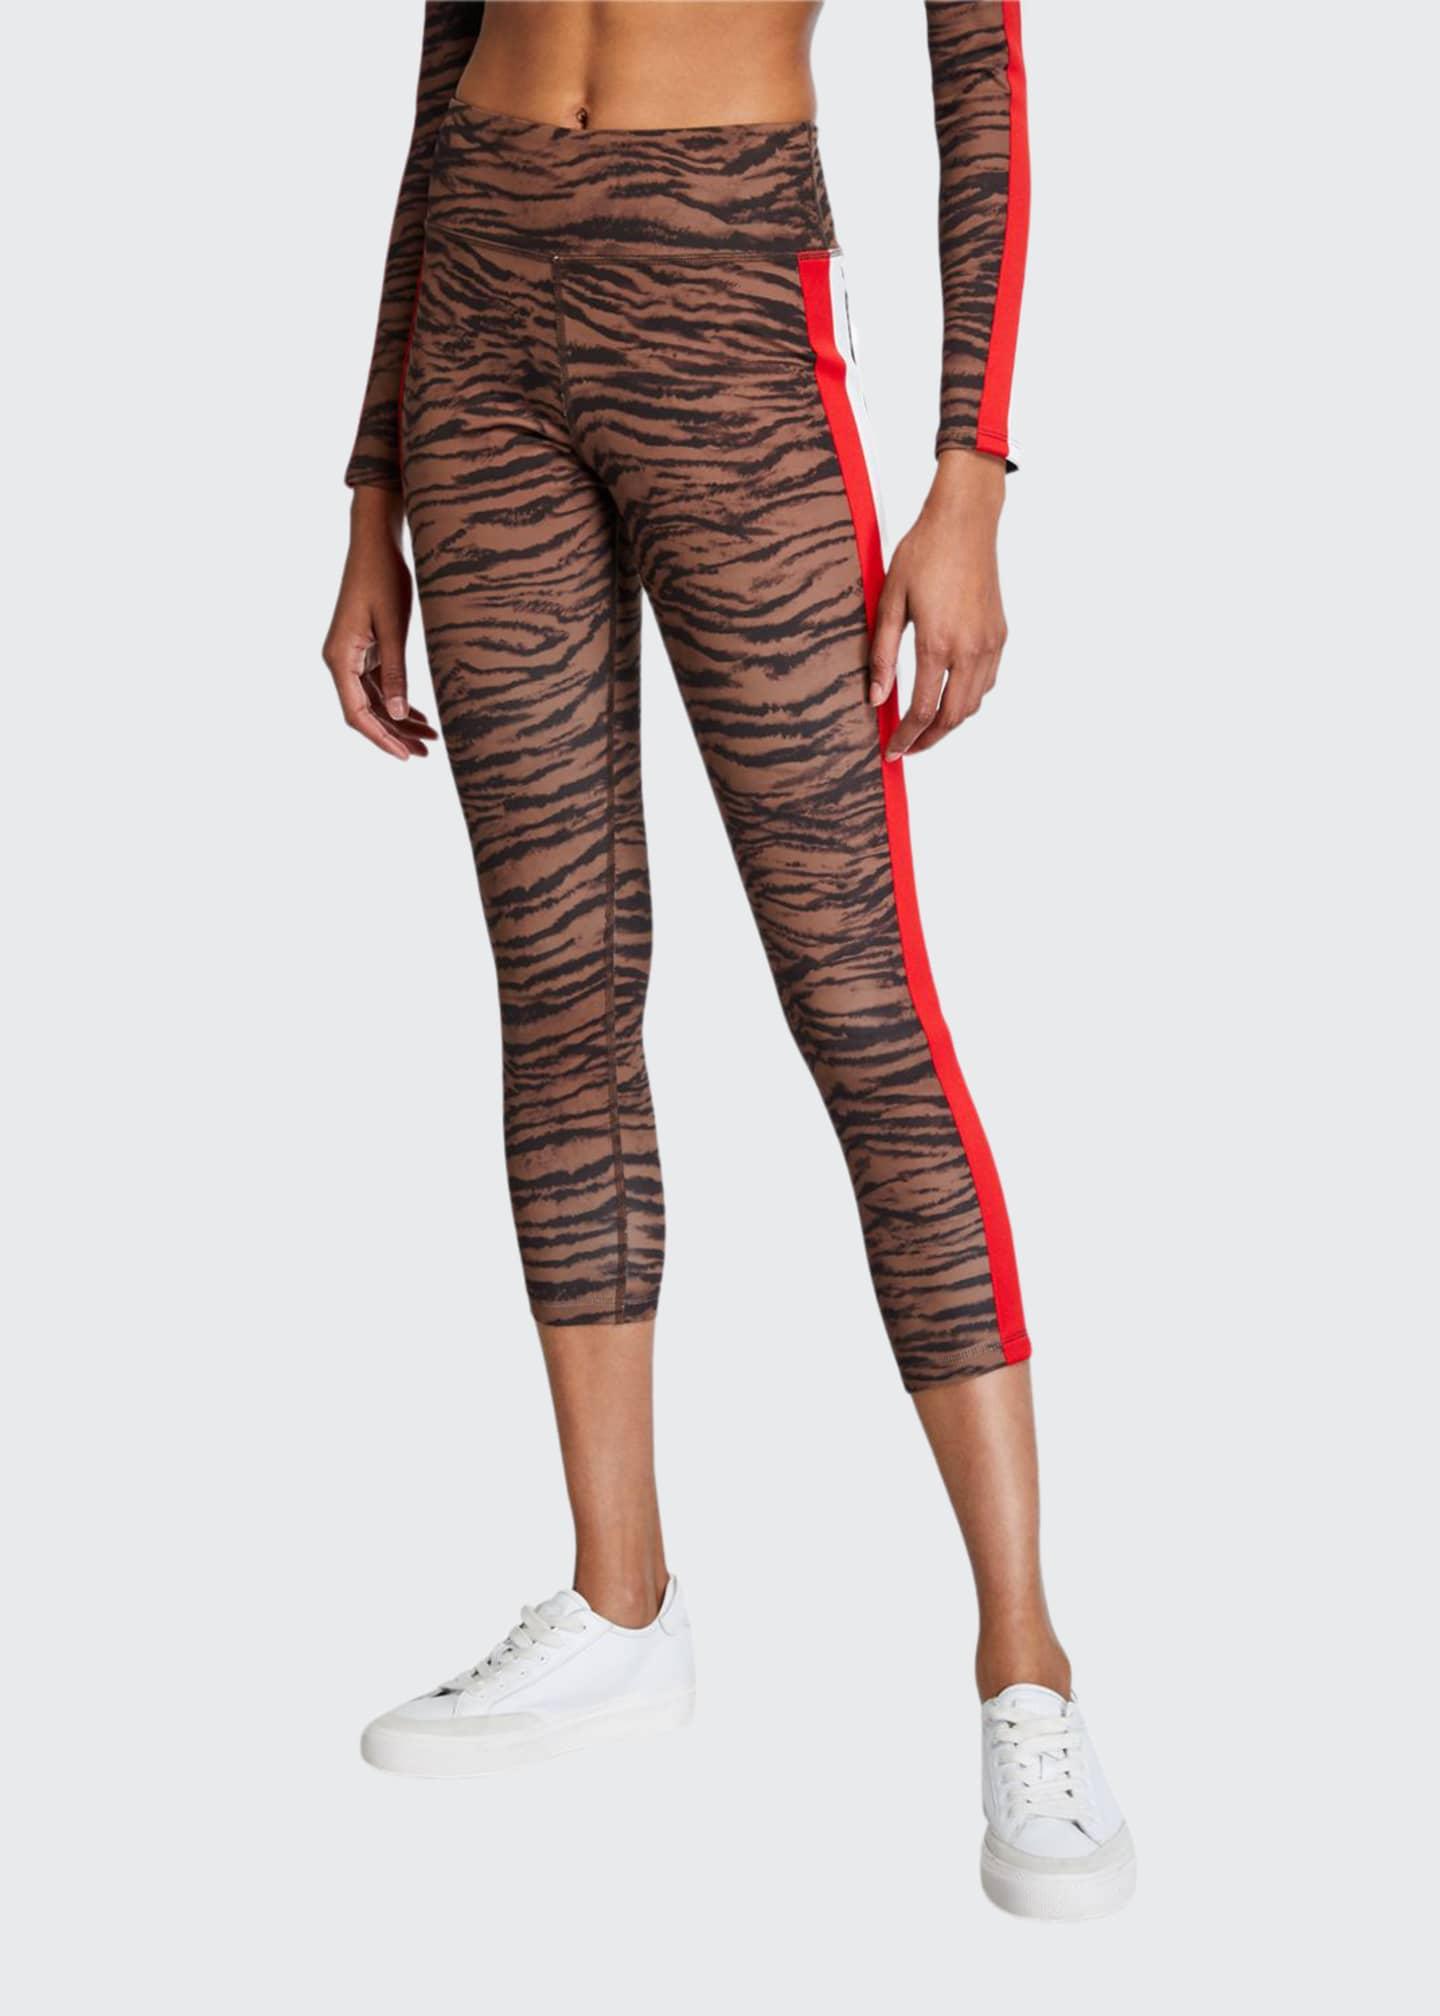 Pam & Gela Tiger Stripe High-Rise 7/8 Leggings